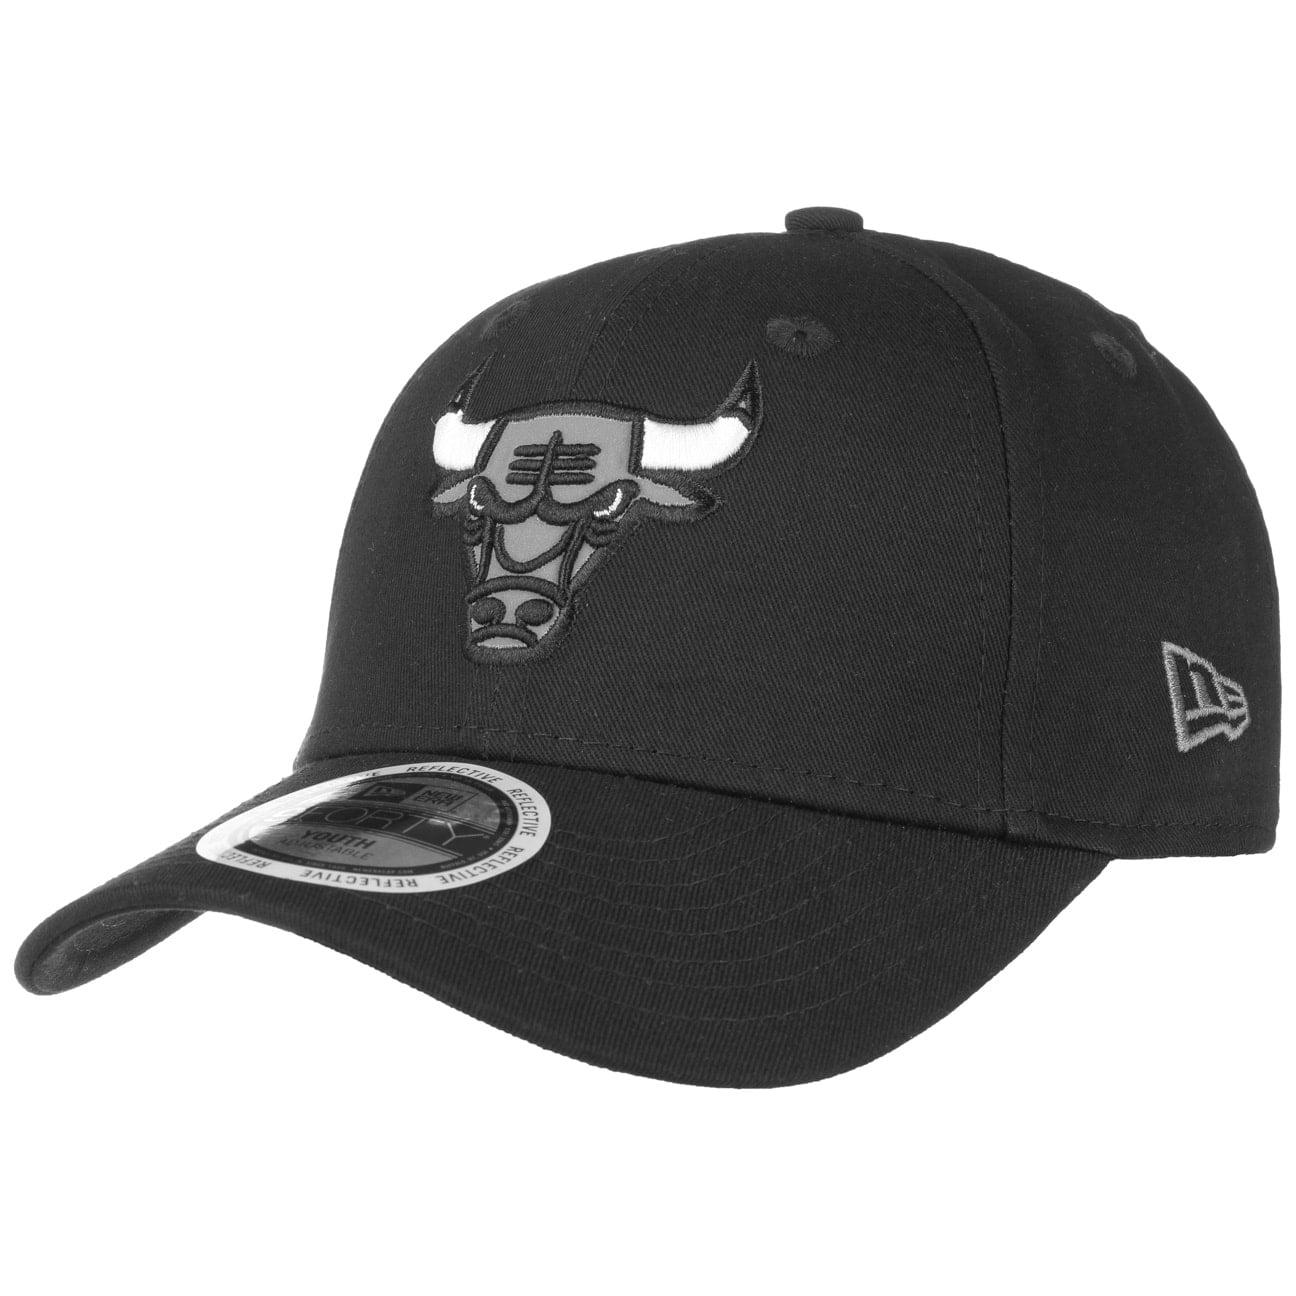 Casquette 9Forty Junior Reflect Bulls by New Era  baseball cap